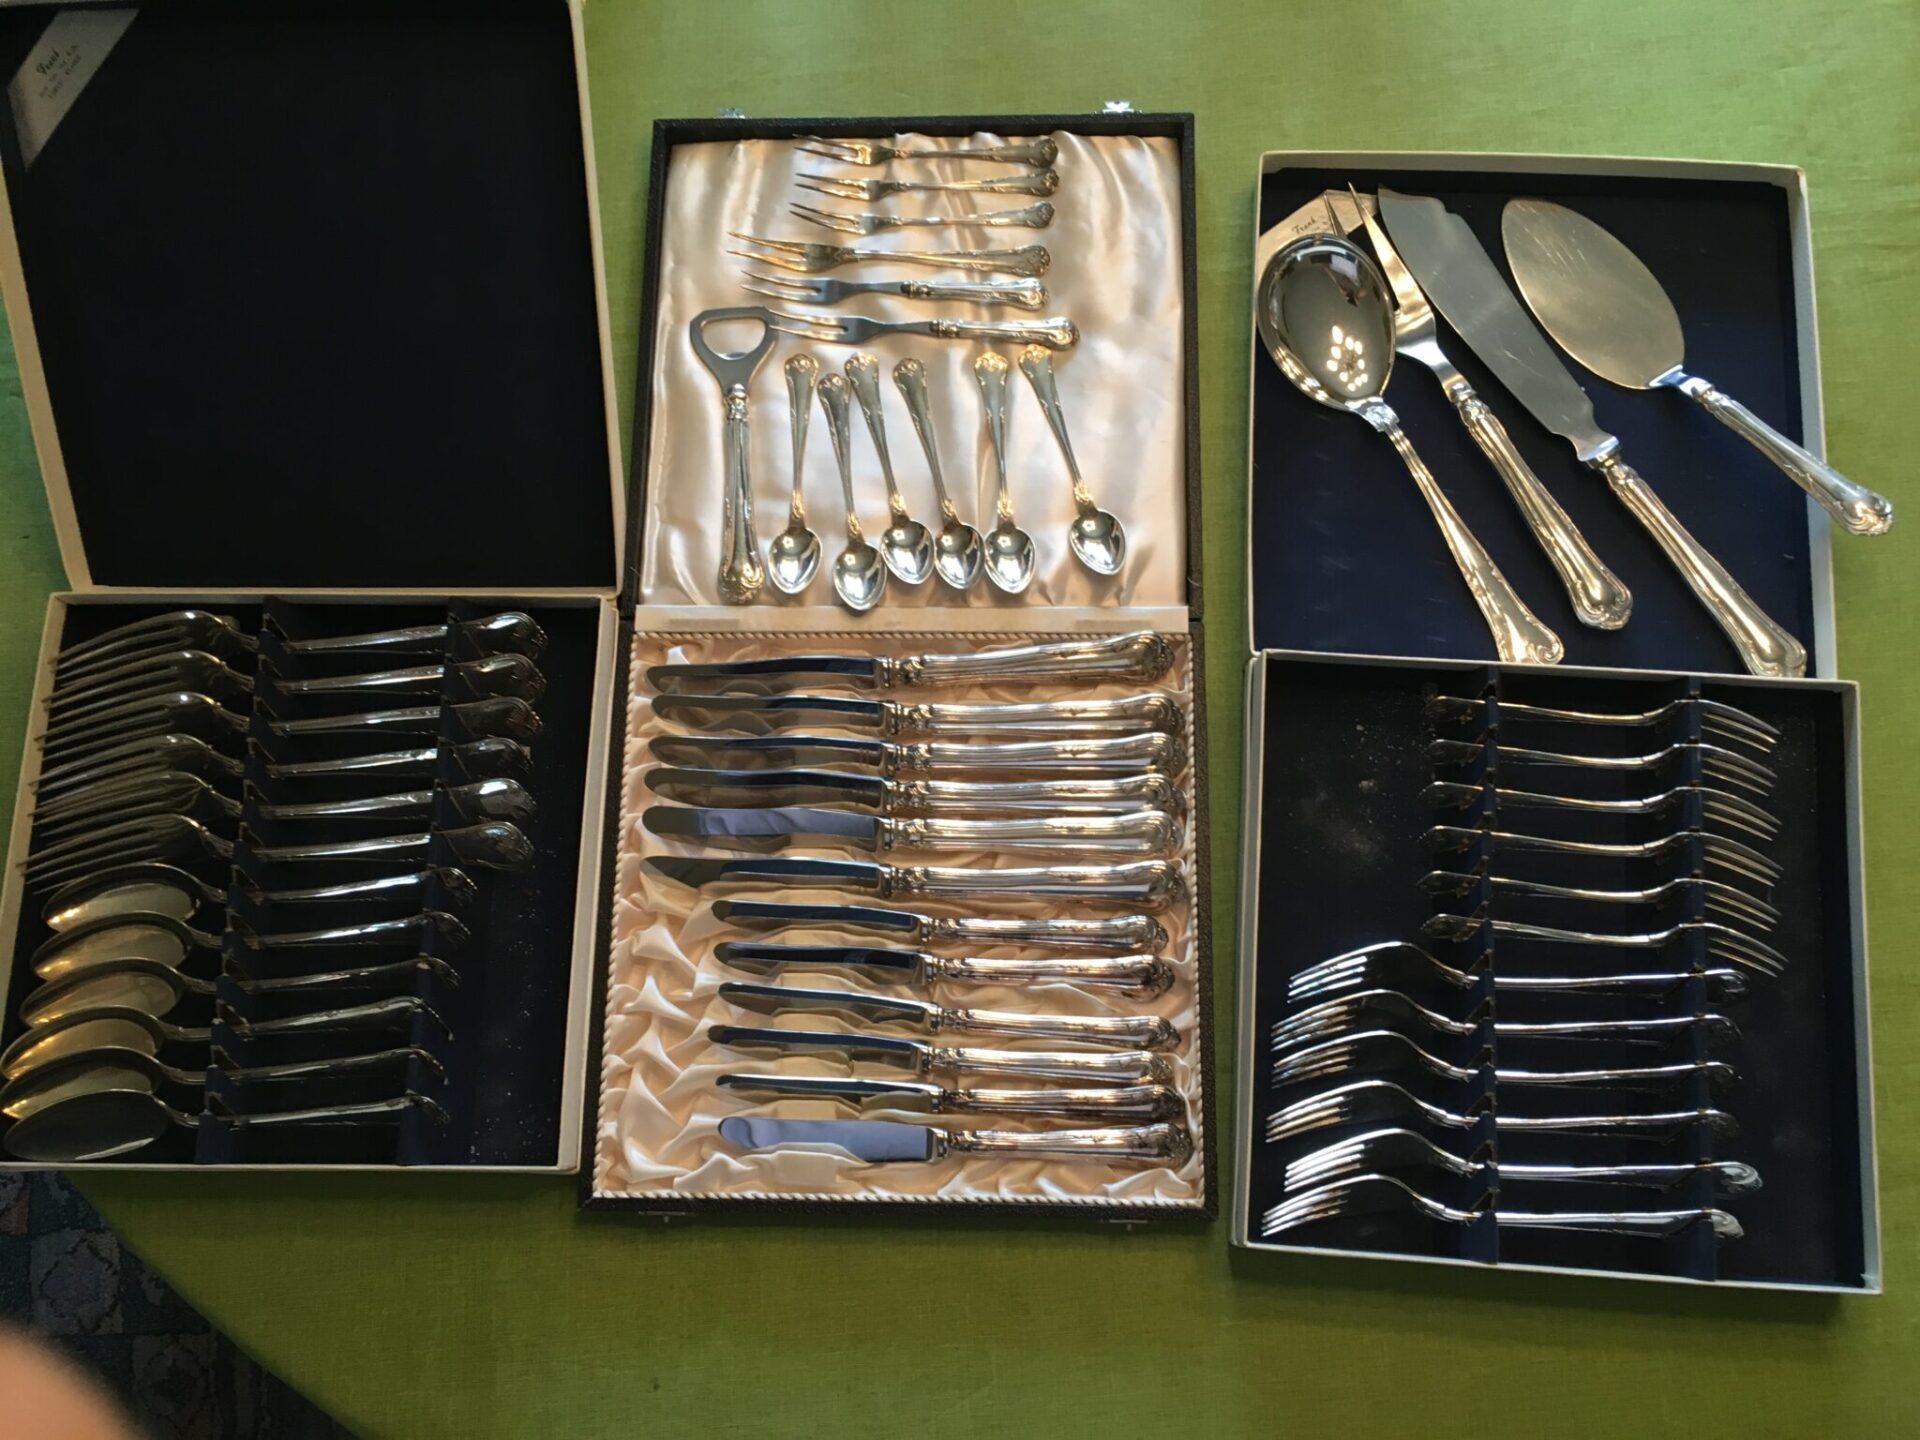 Cohr sølvbestik,